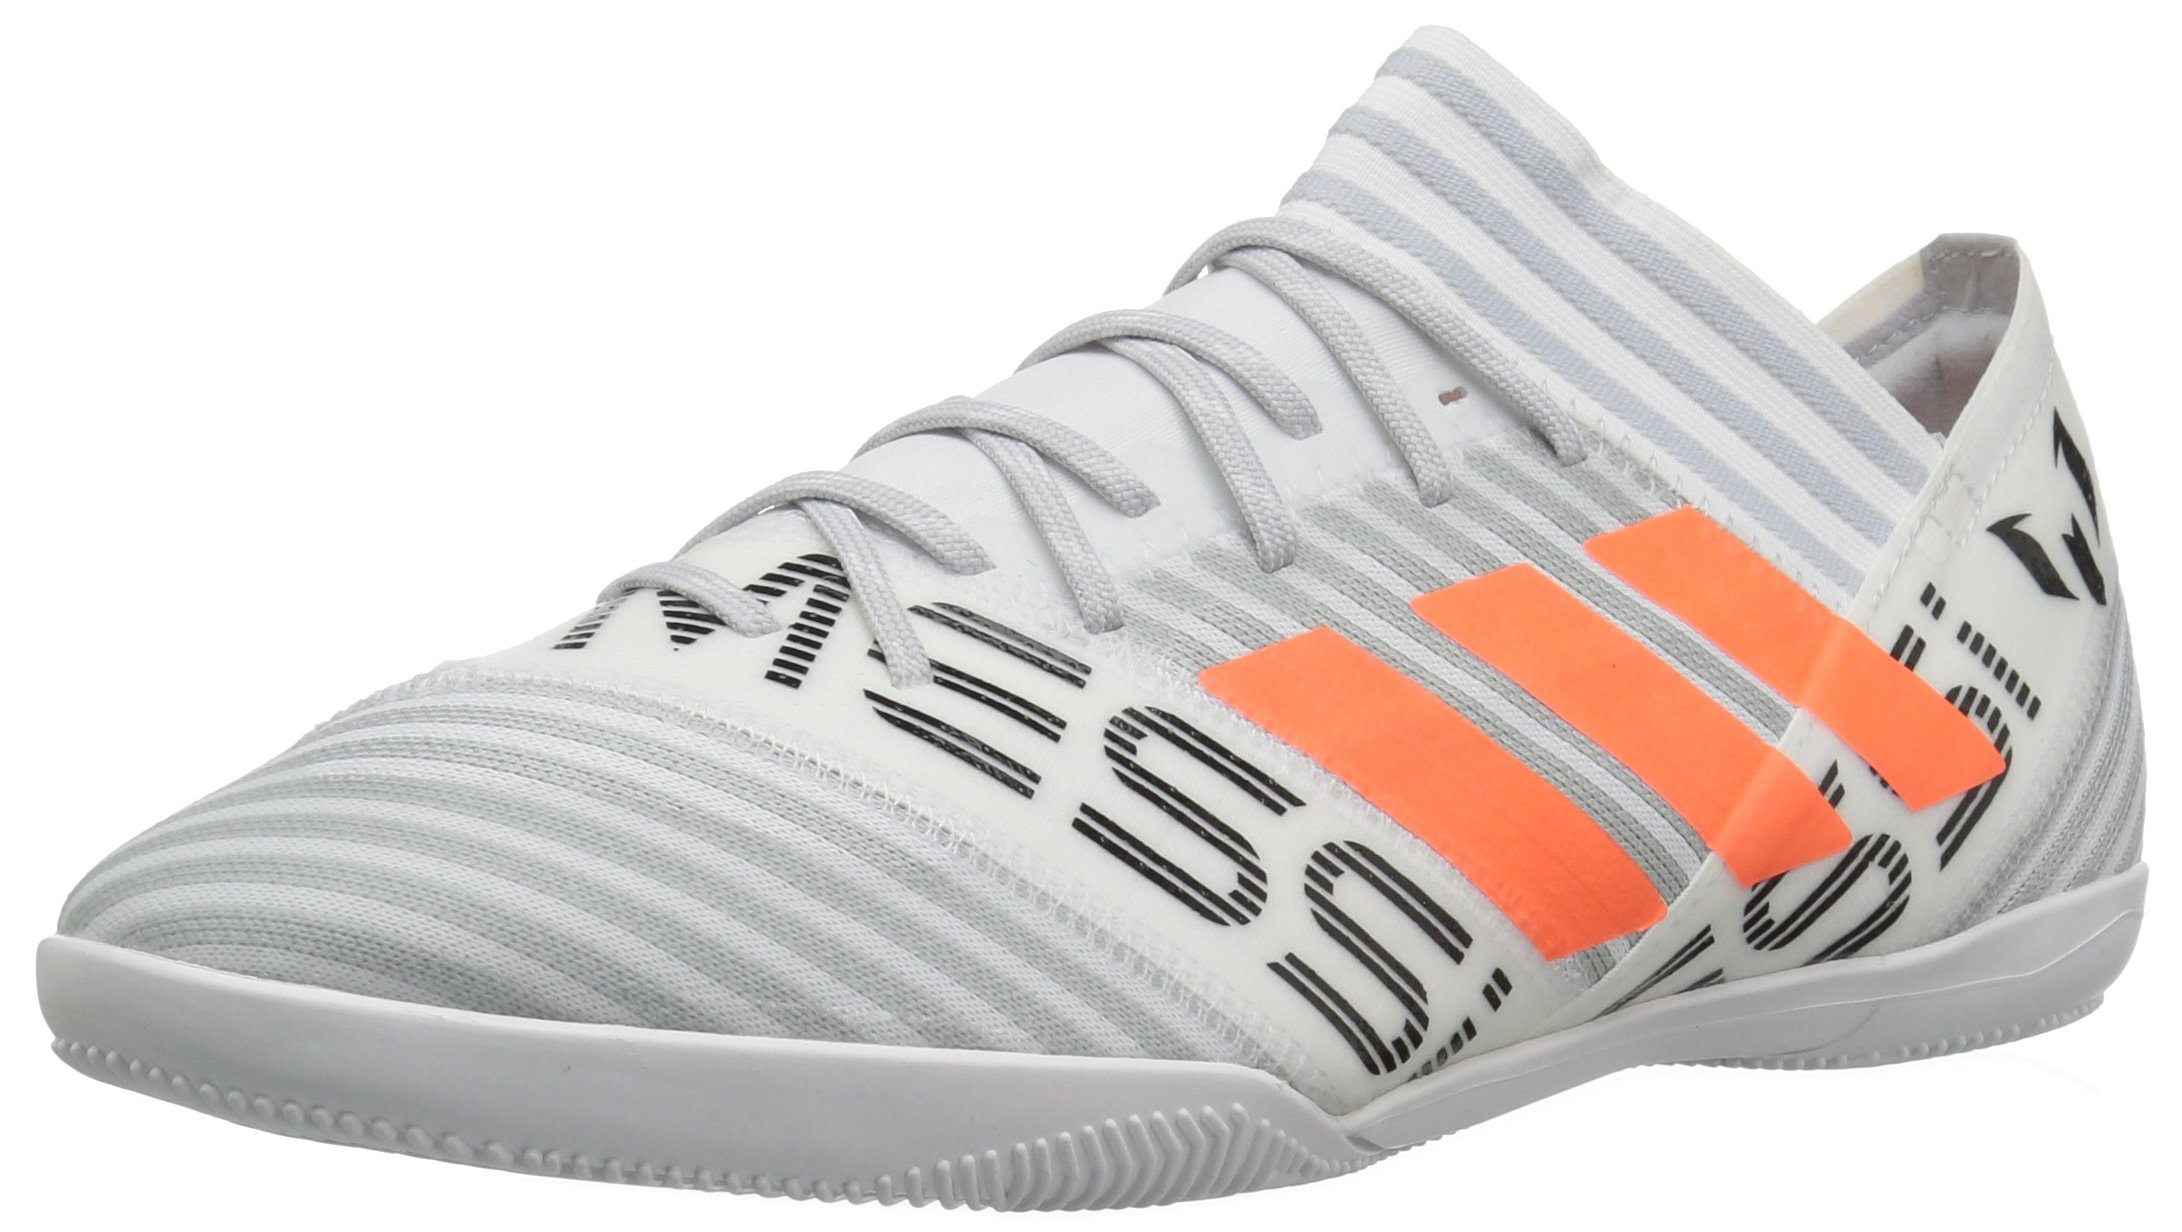 59e49ddb9254 Galleon - Adidas Men s Nemeziz Messi Tango 17.3 In Soccer Shoe ...